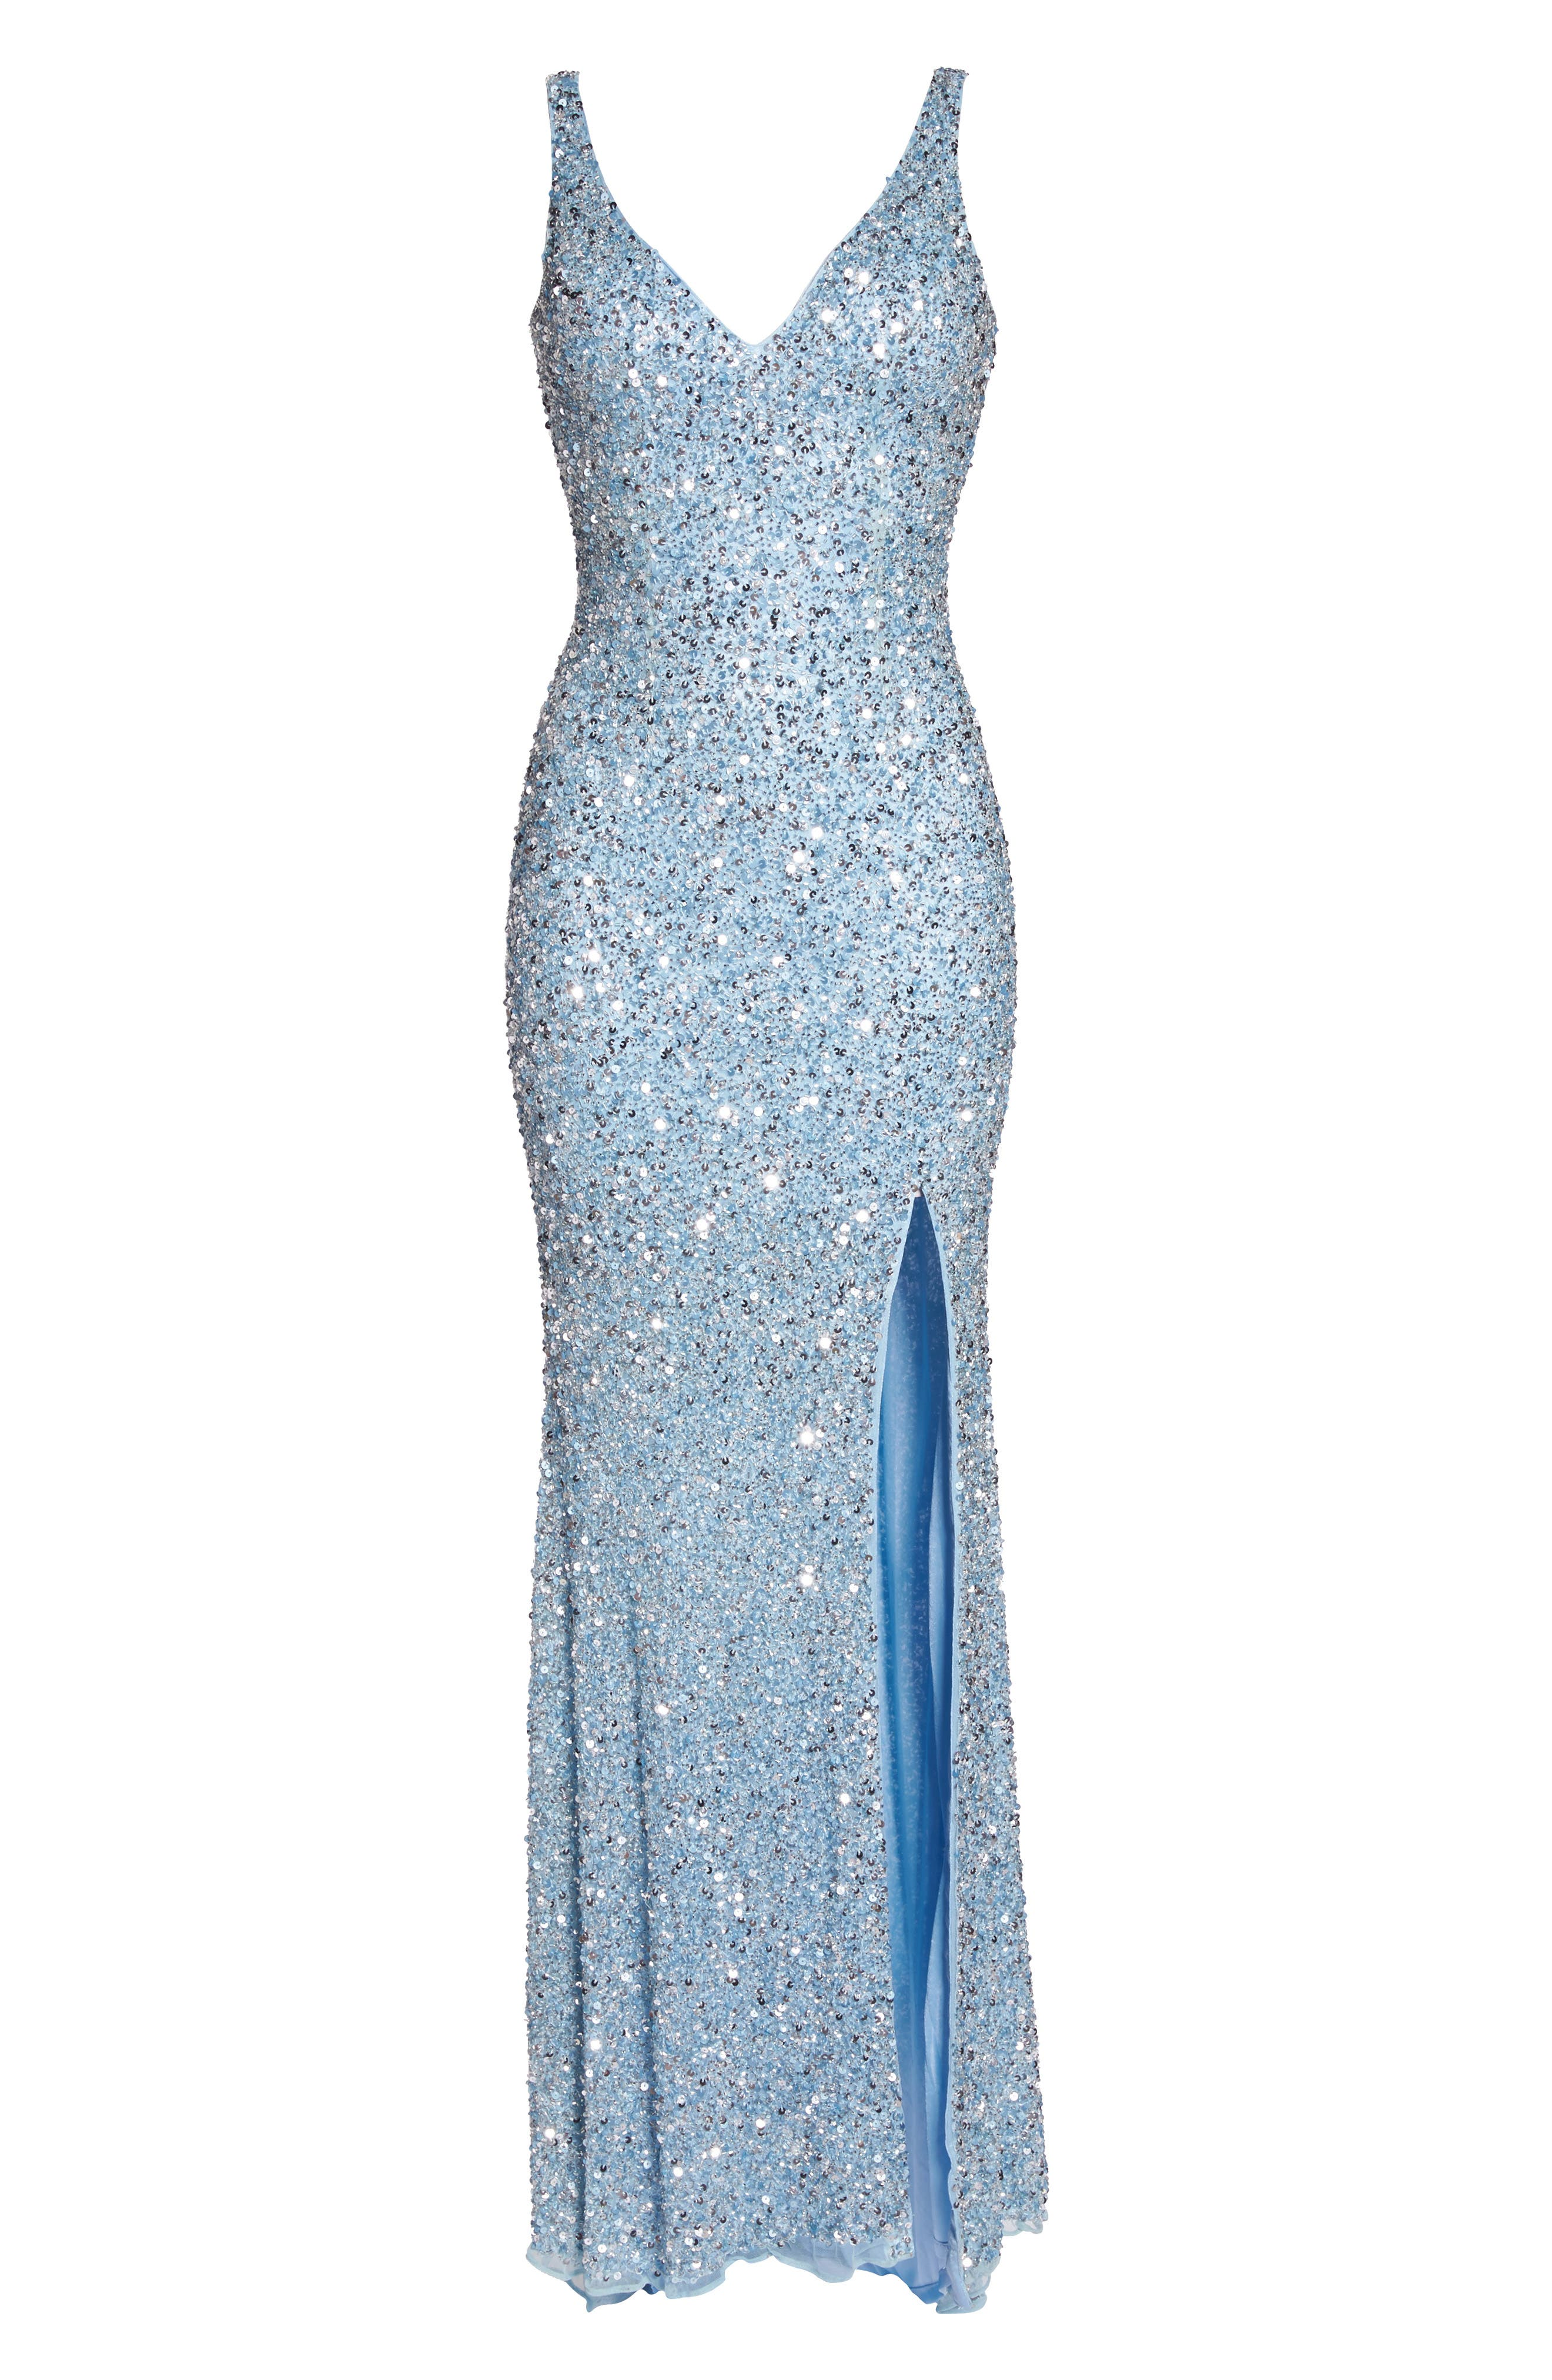 V-Neck Sequin Gown,                             Alternate thumbnail 6, color,                             Powder Blue